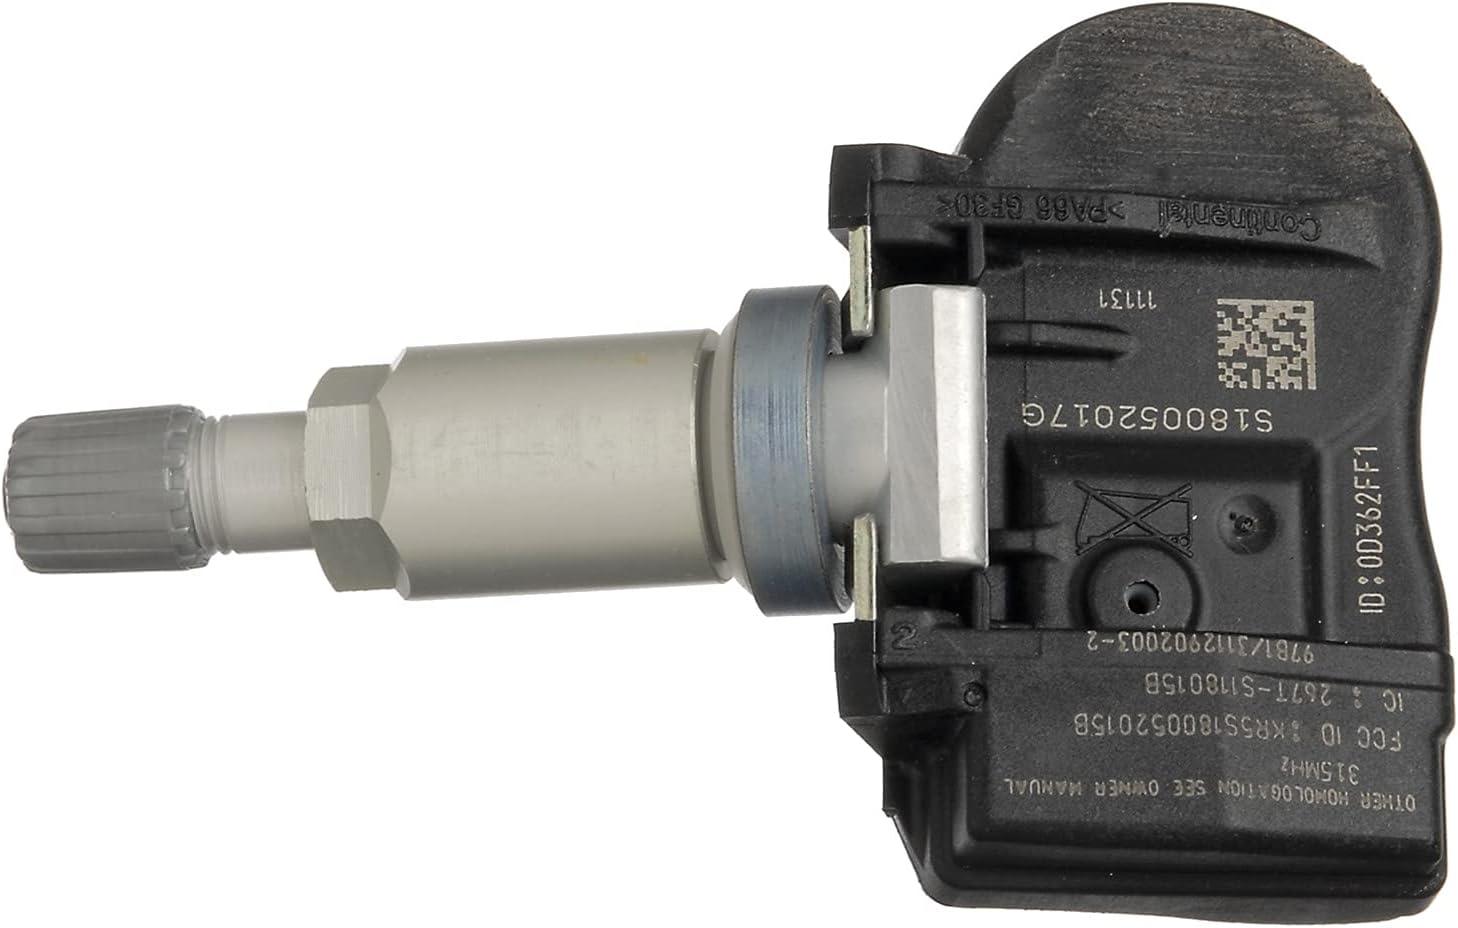 Schrader Fees Max 89% OFF free 20092 TPMS Sensor